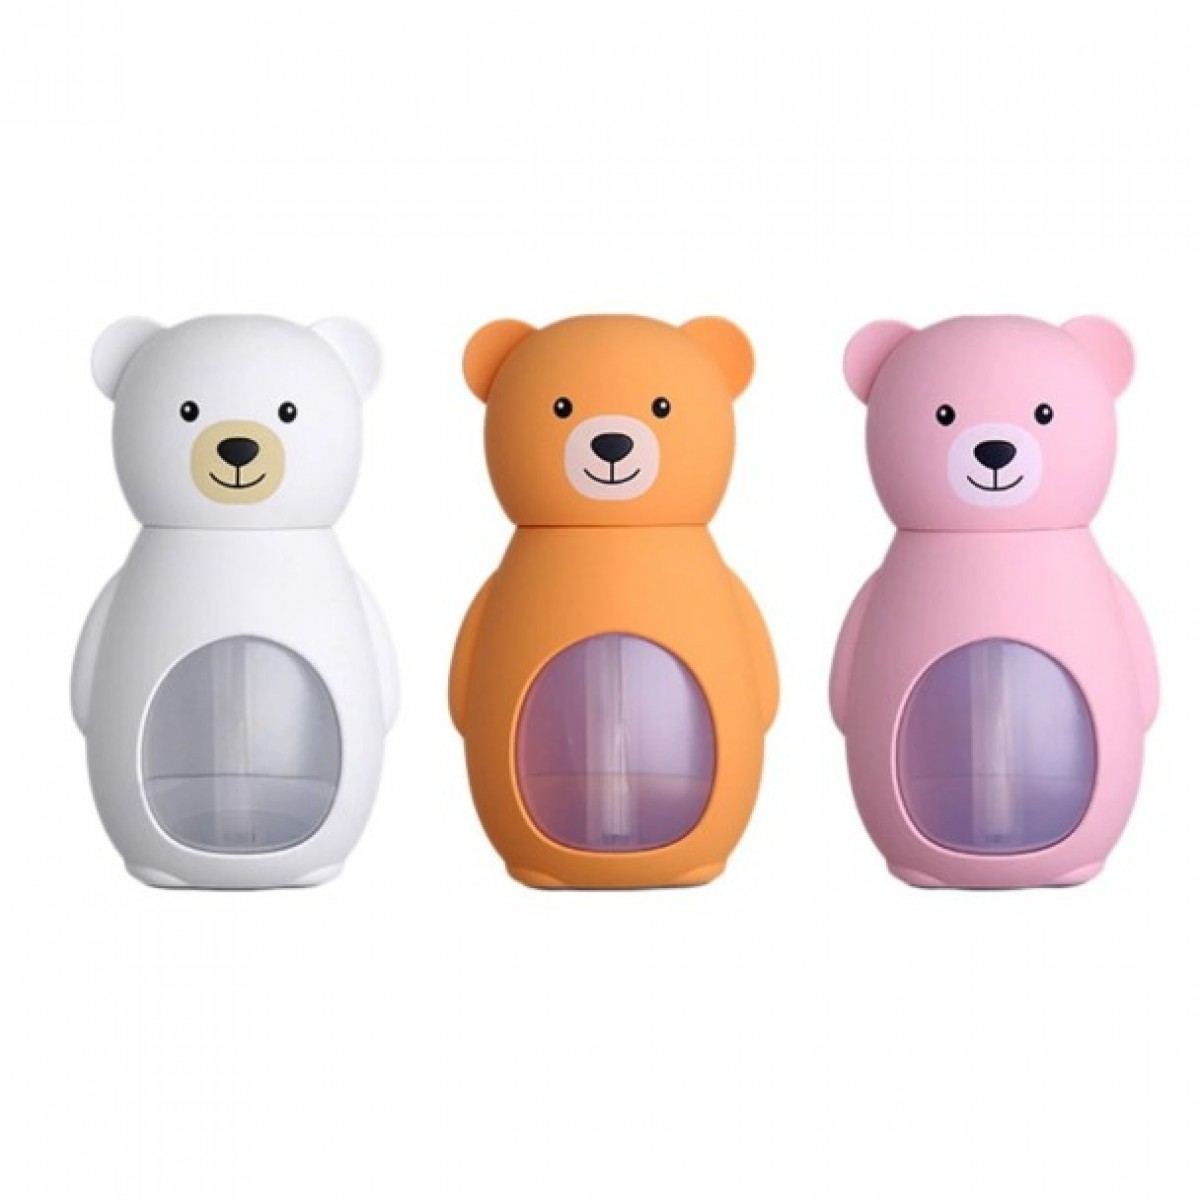 Bear Air Humidifier Aroma Diffuser - Bunda Ina Shop